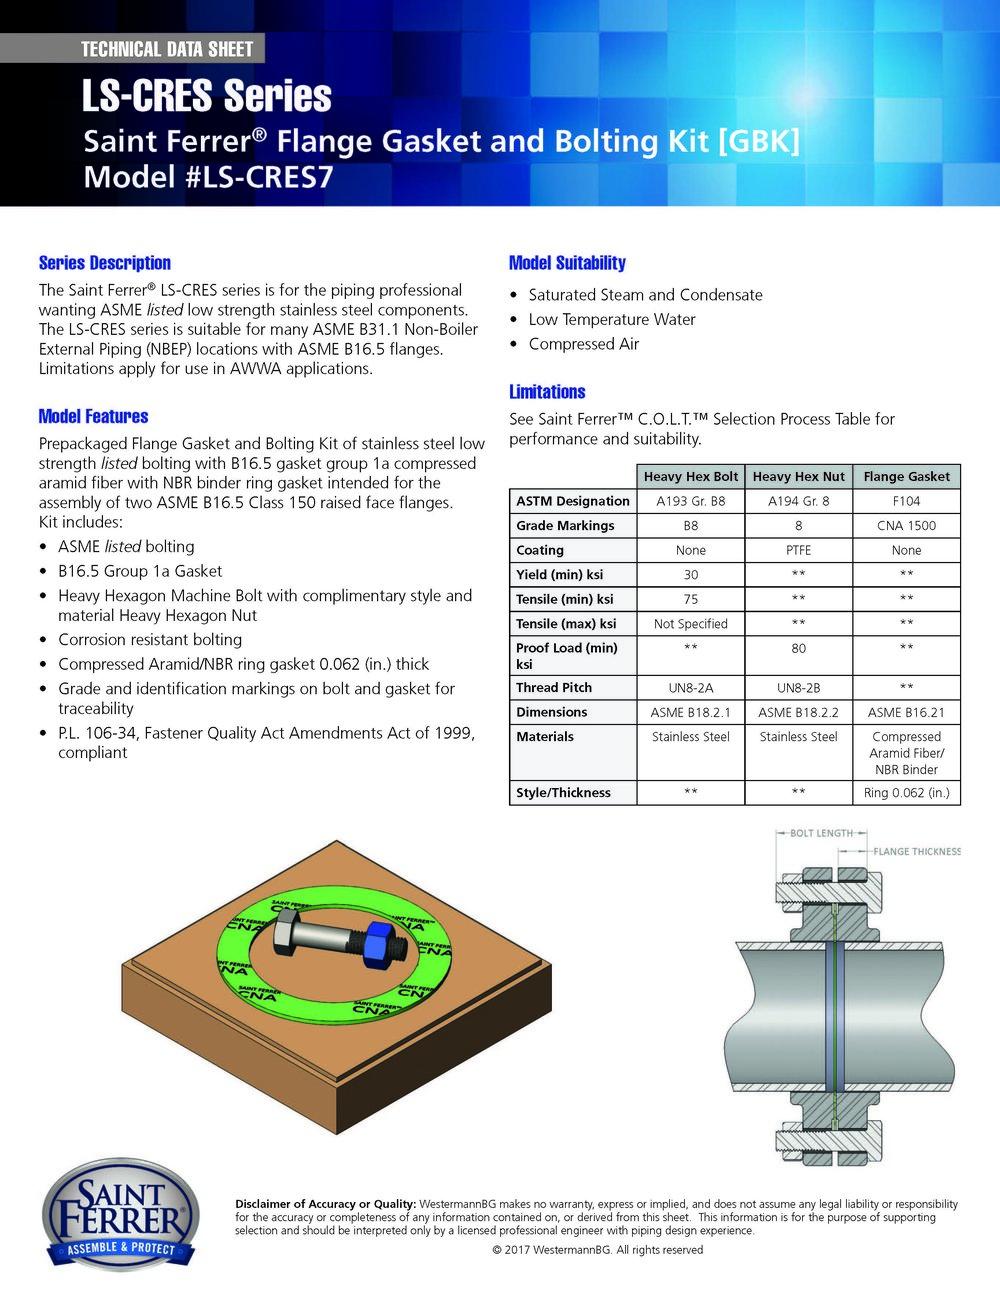 SF_Data_Sheet_LS-CRES_Series_LS-CRES7.jpg